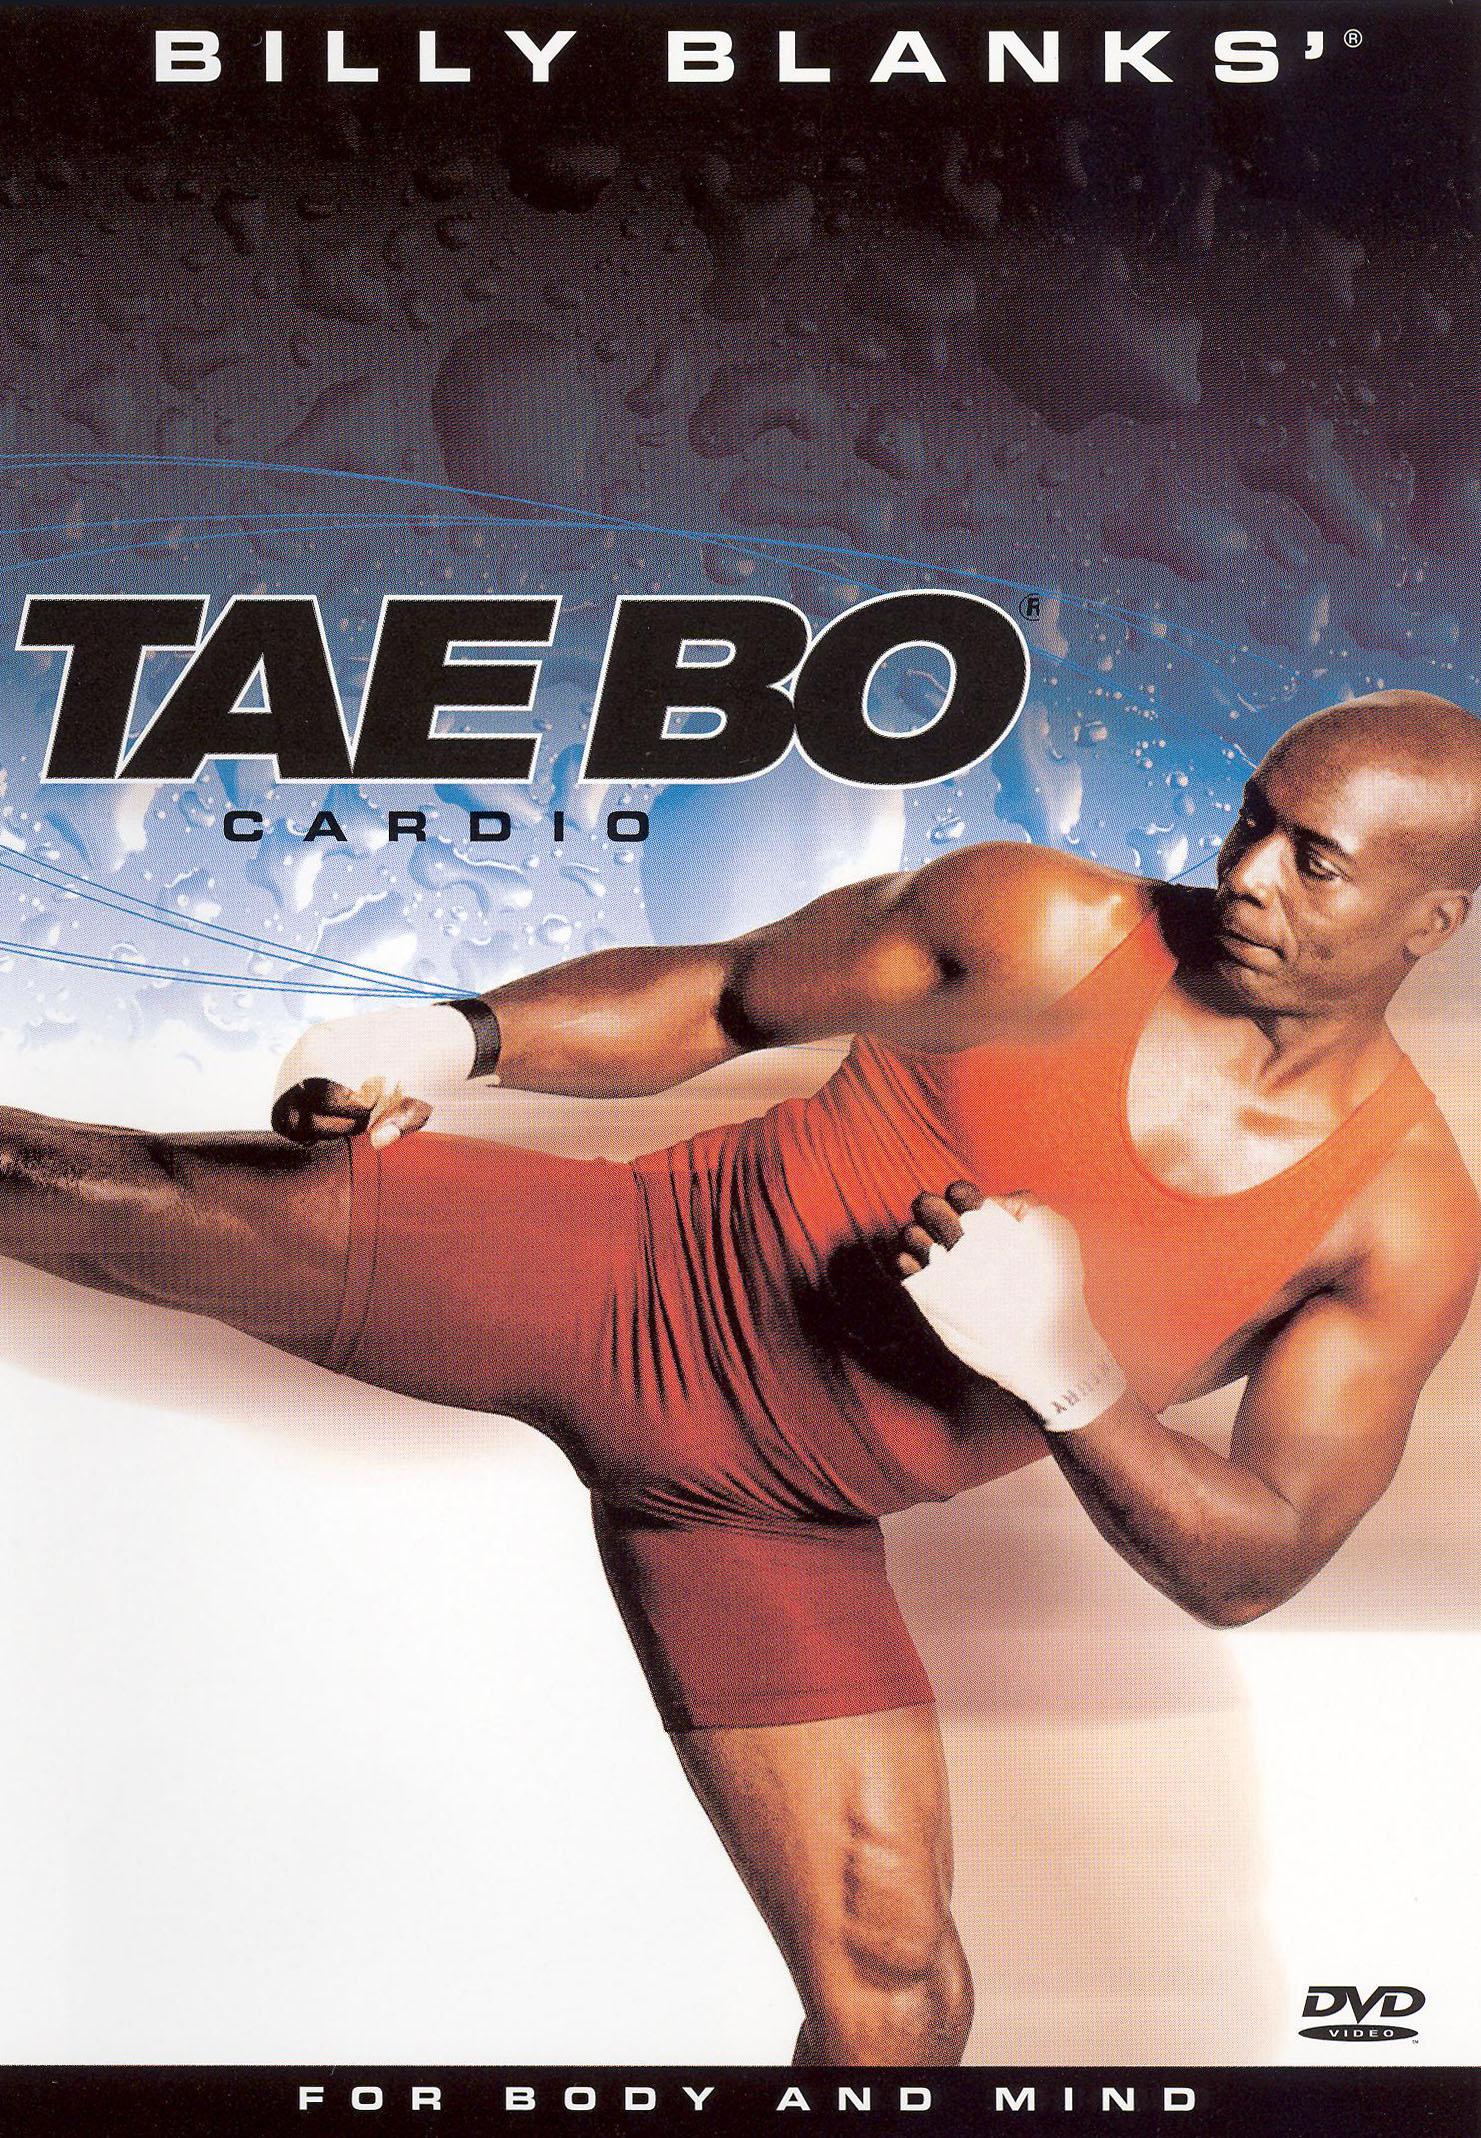 Billy Blanks: Tae Bo Cardio